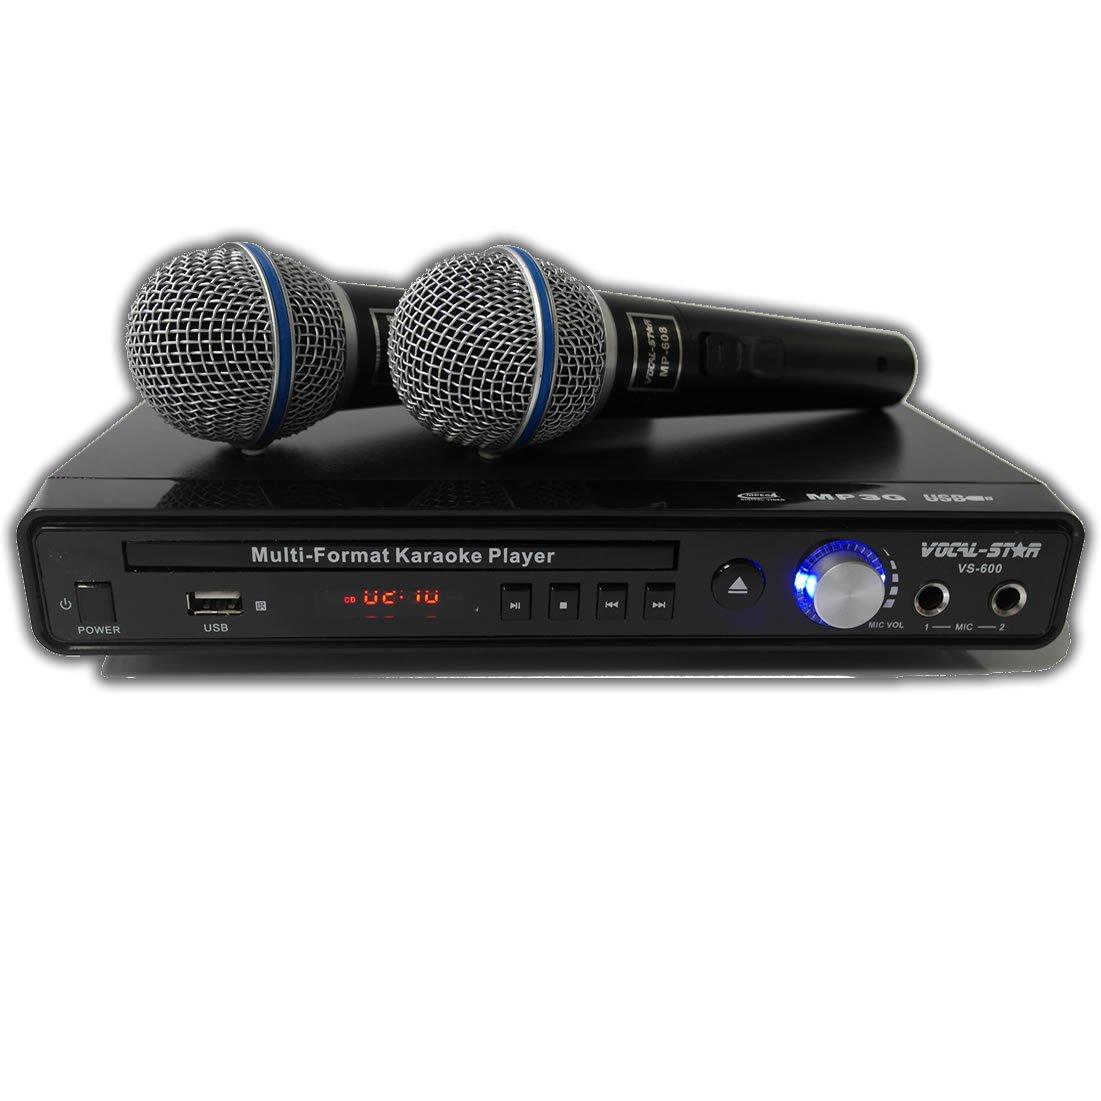 Vocal-Star VS-600 Black HDMI CDG DVD Karaoke Machine 2 Microphones & 150 Songs